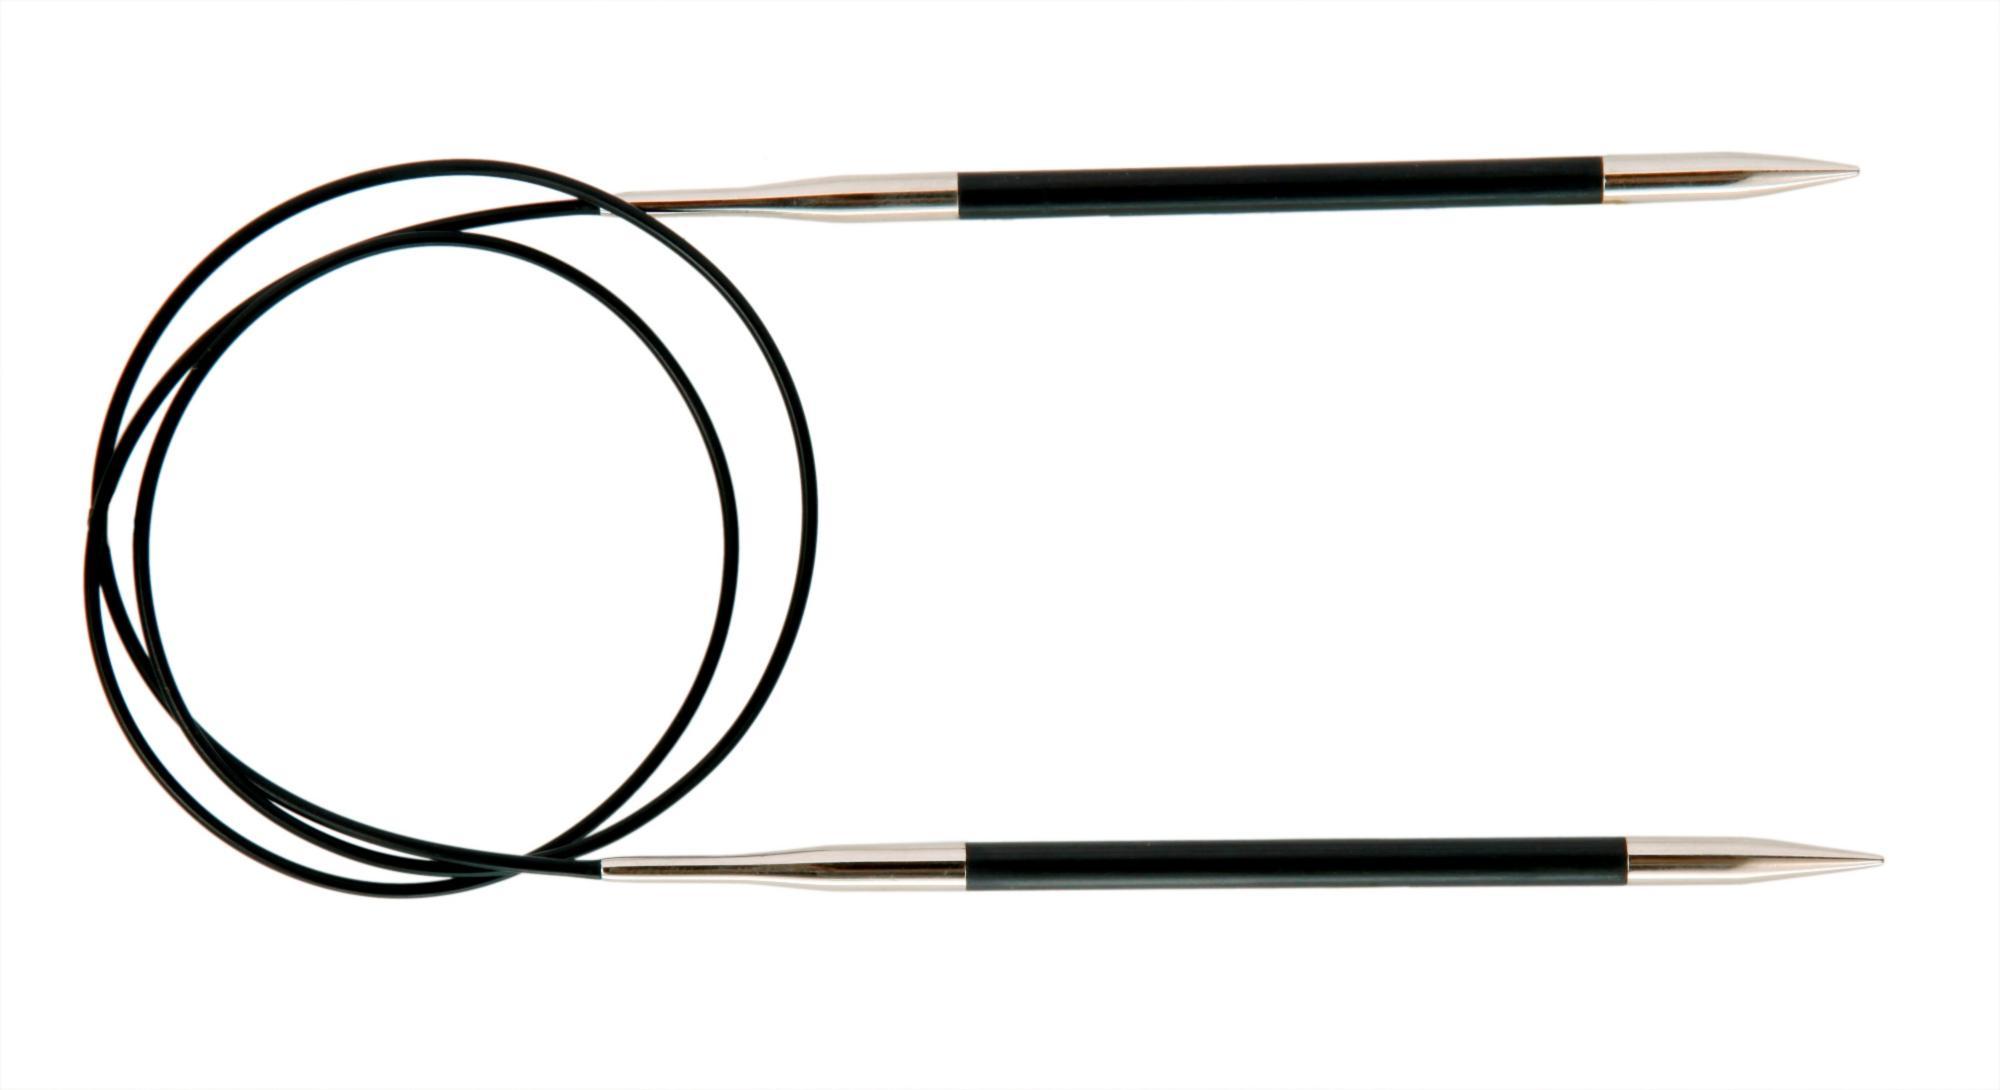 Спицы круговые 40 см Karbonz KnitPro, 41142, 2.50 мм